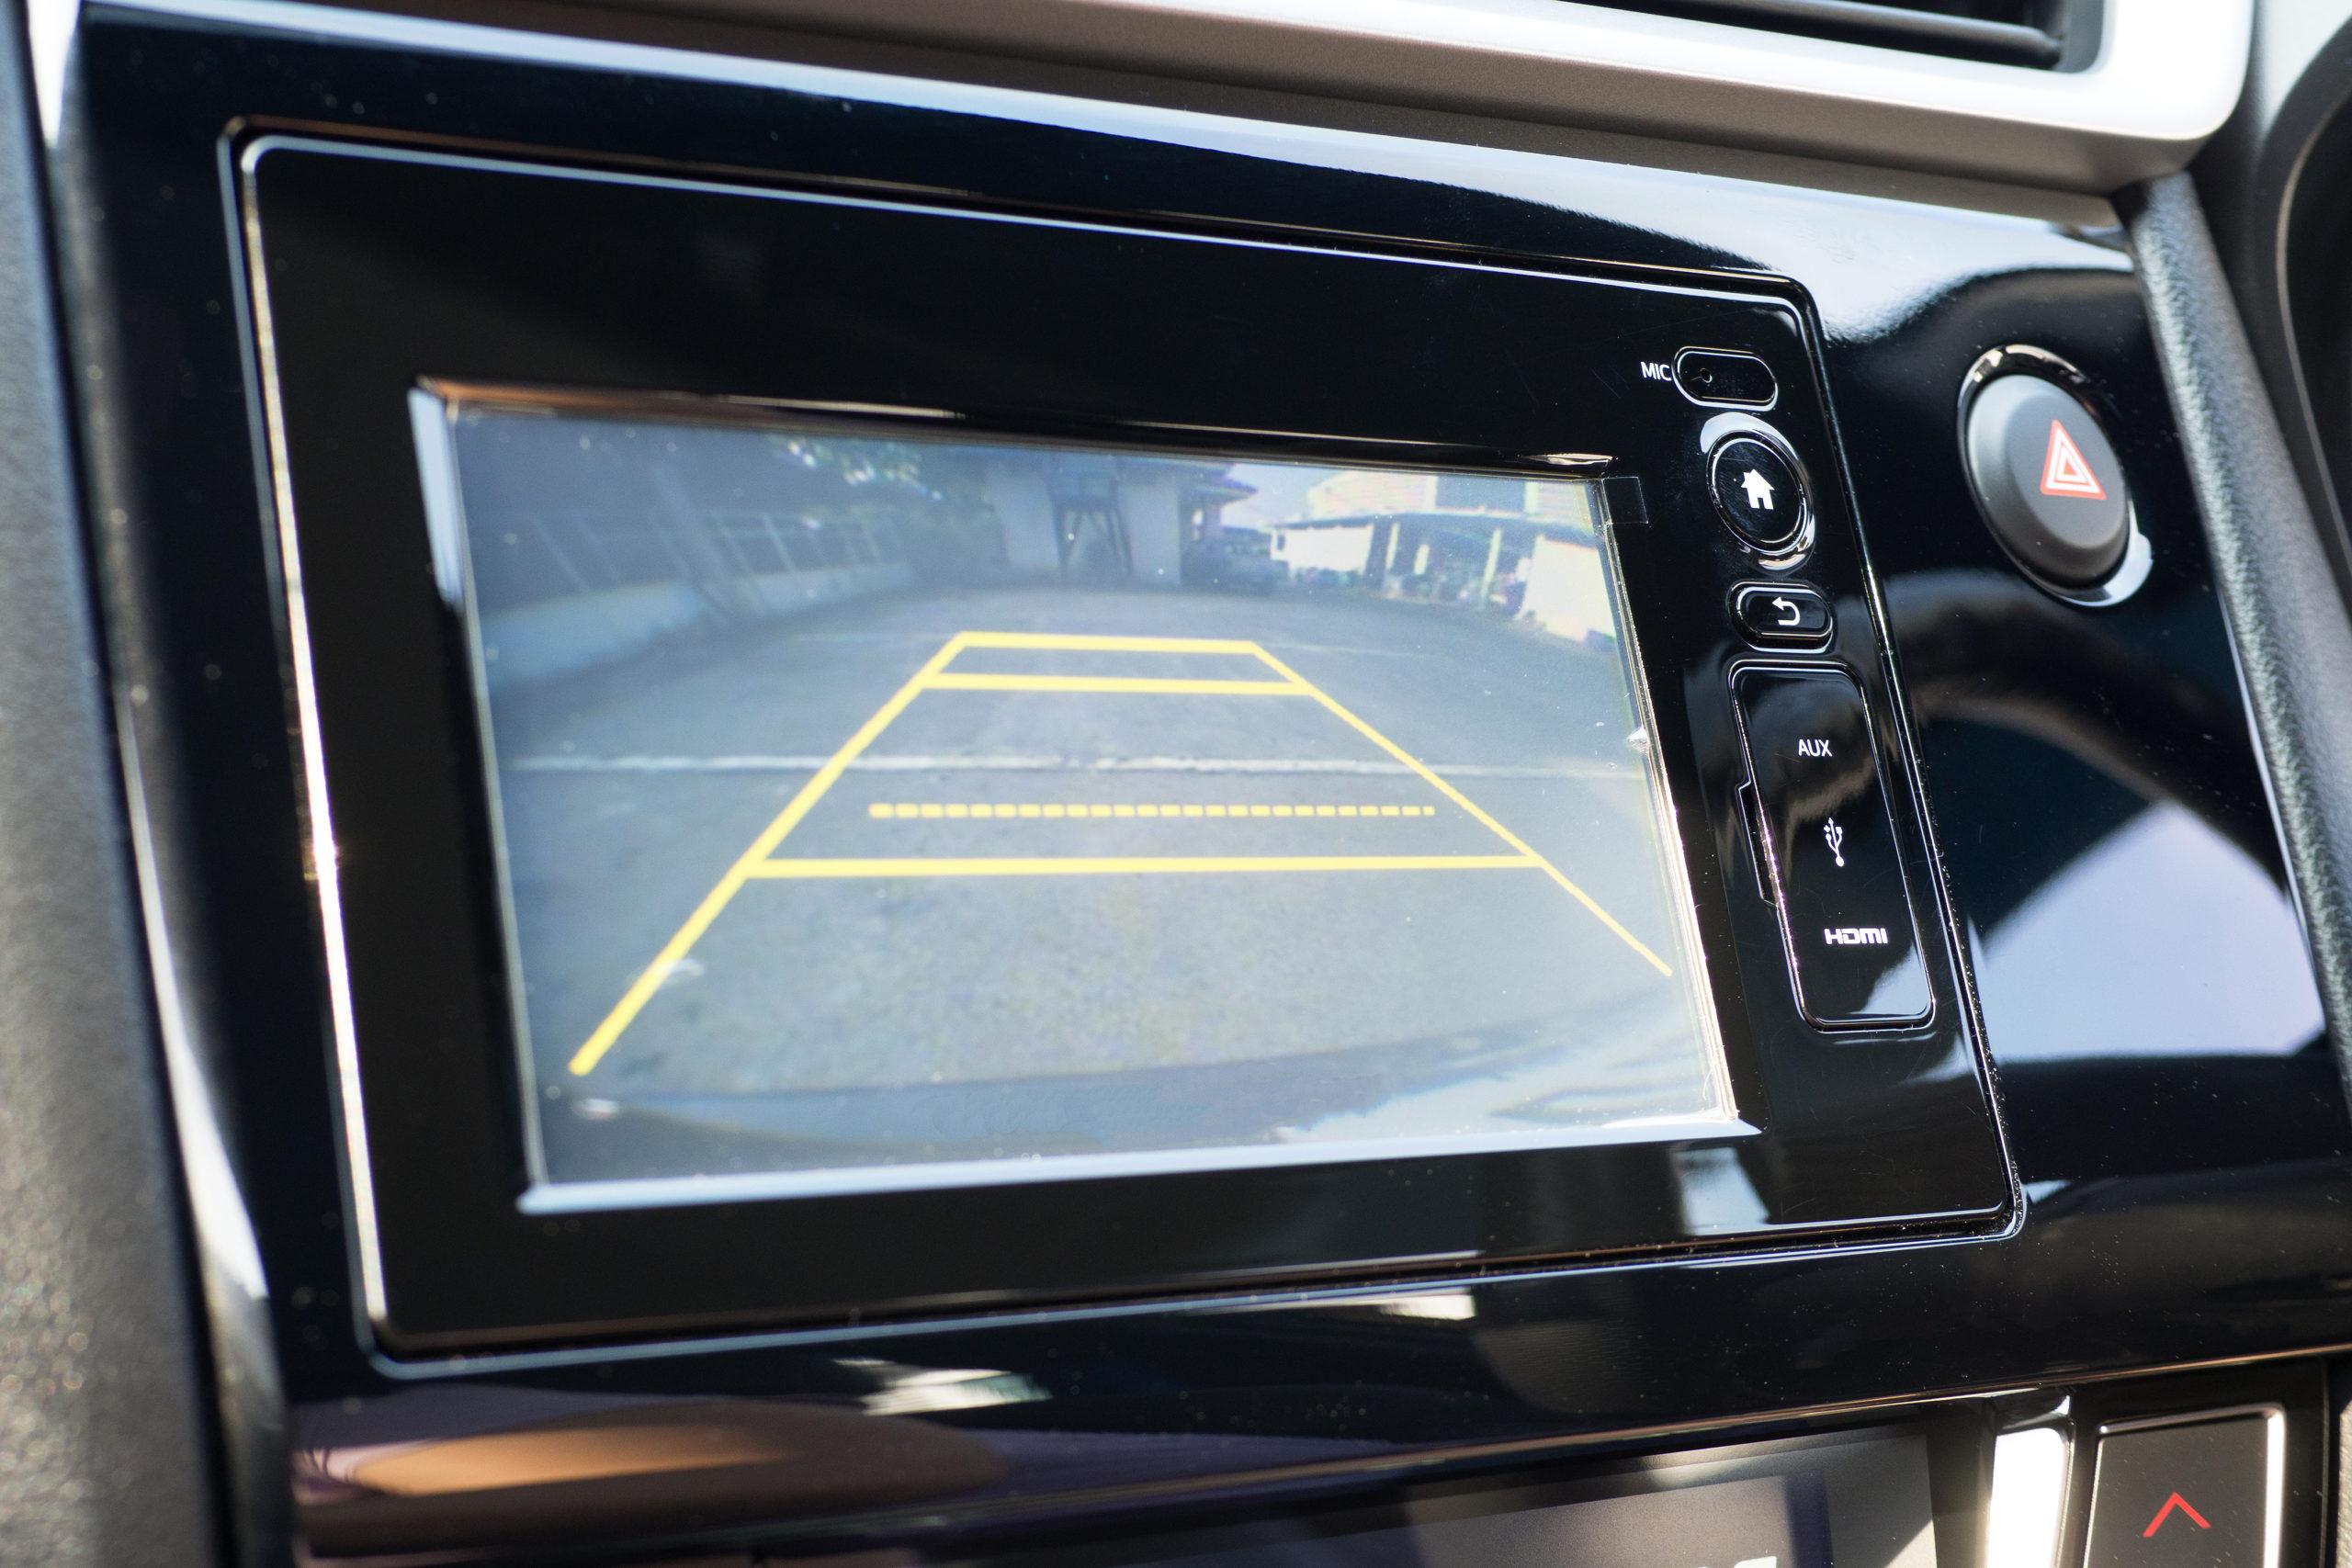 back up camera screen in car